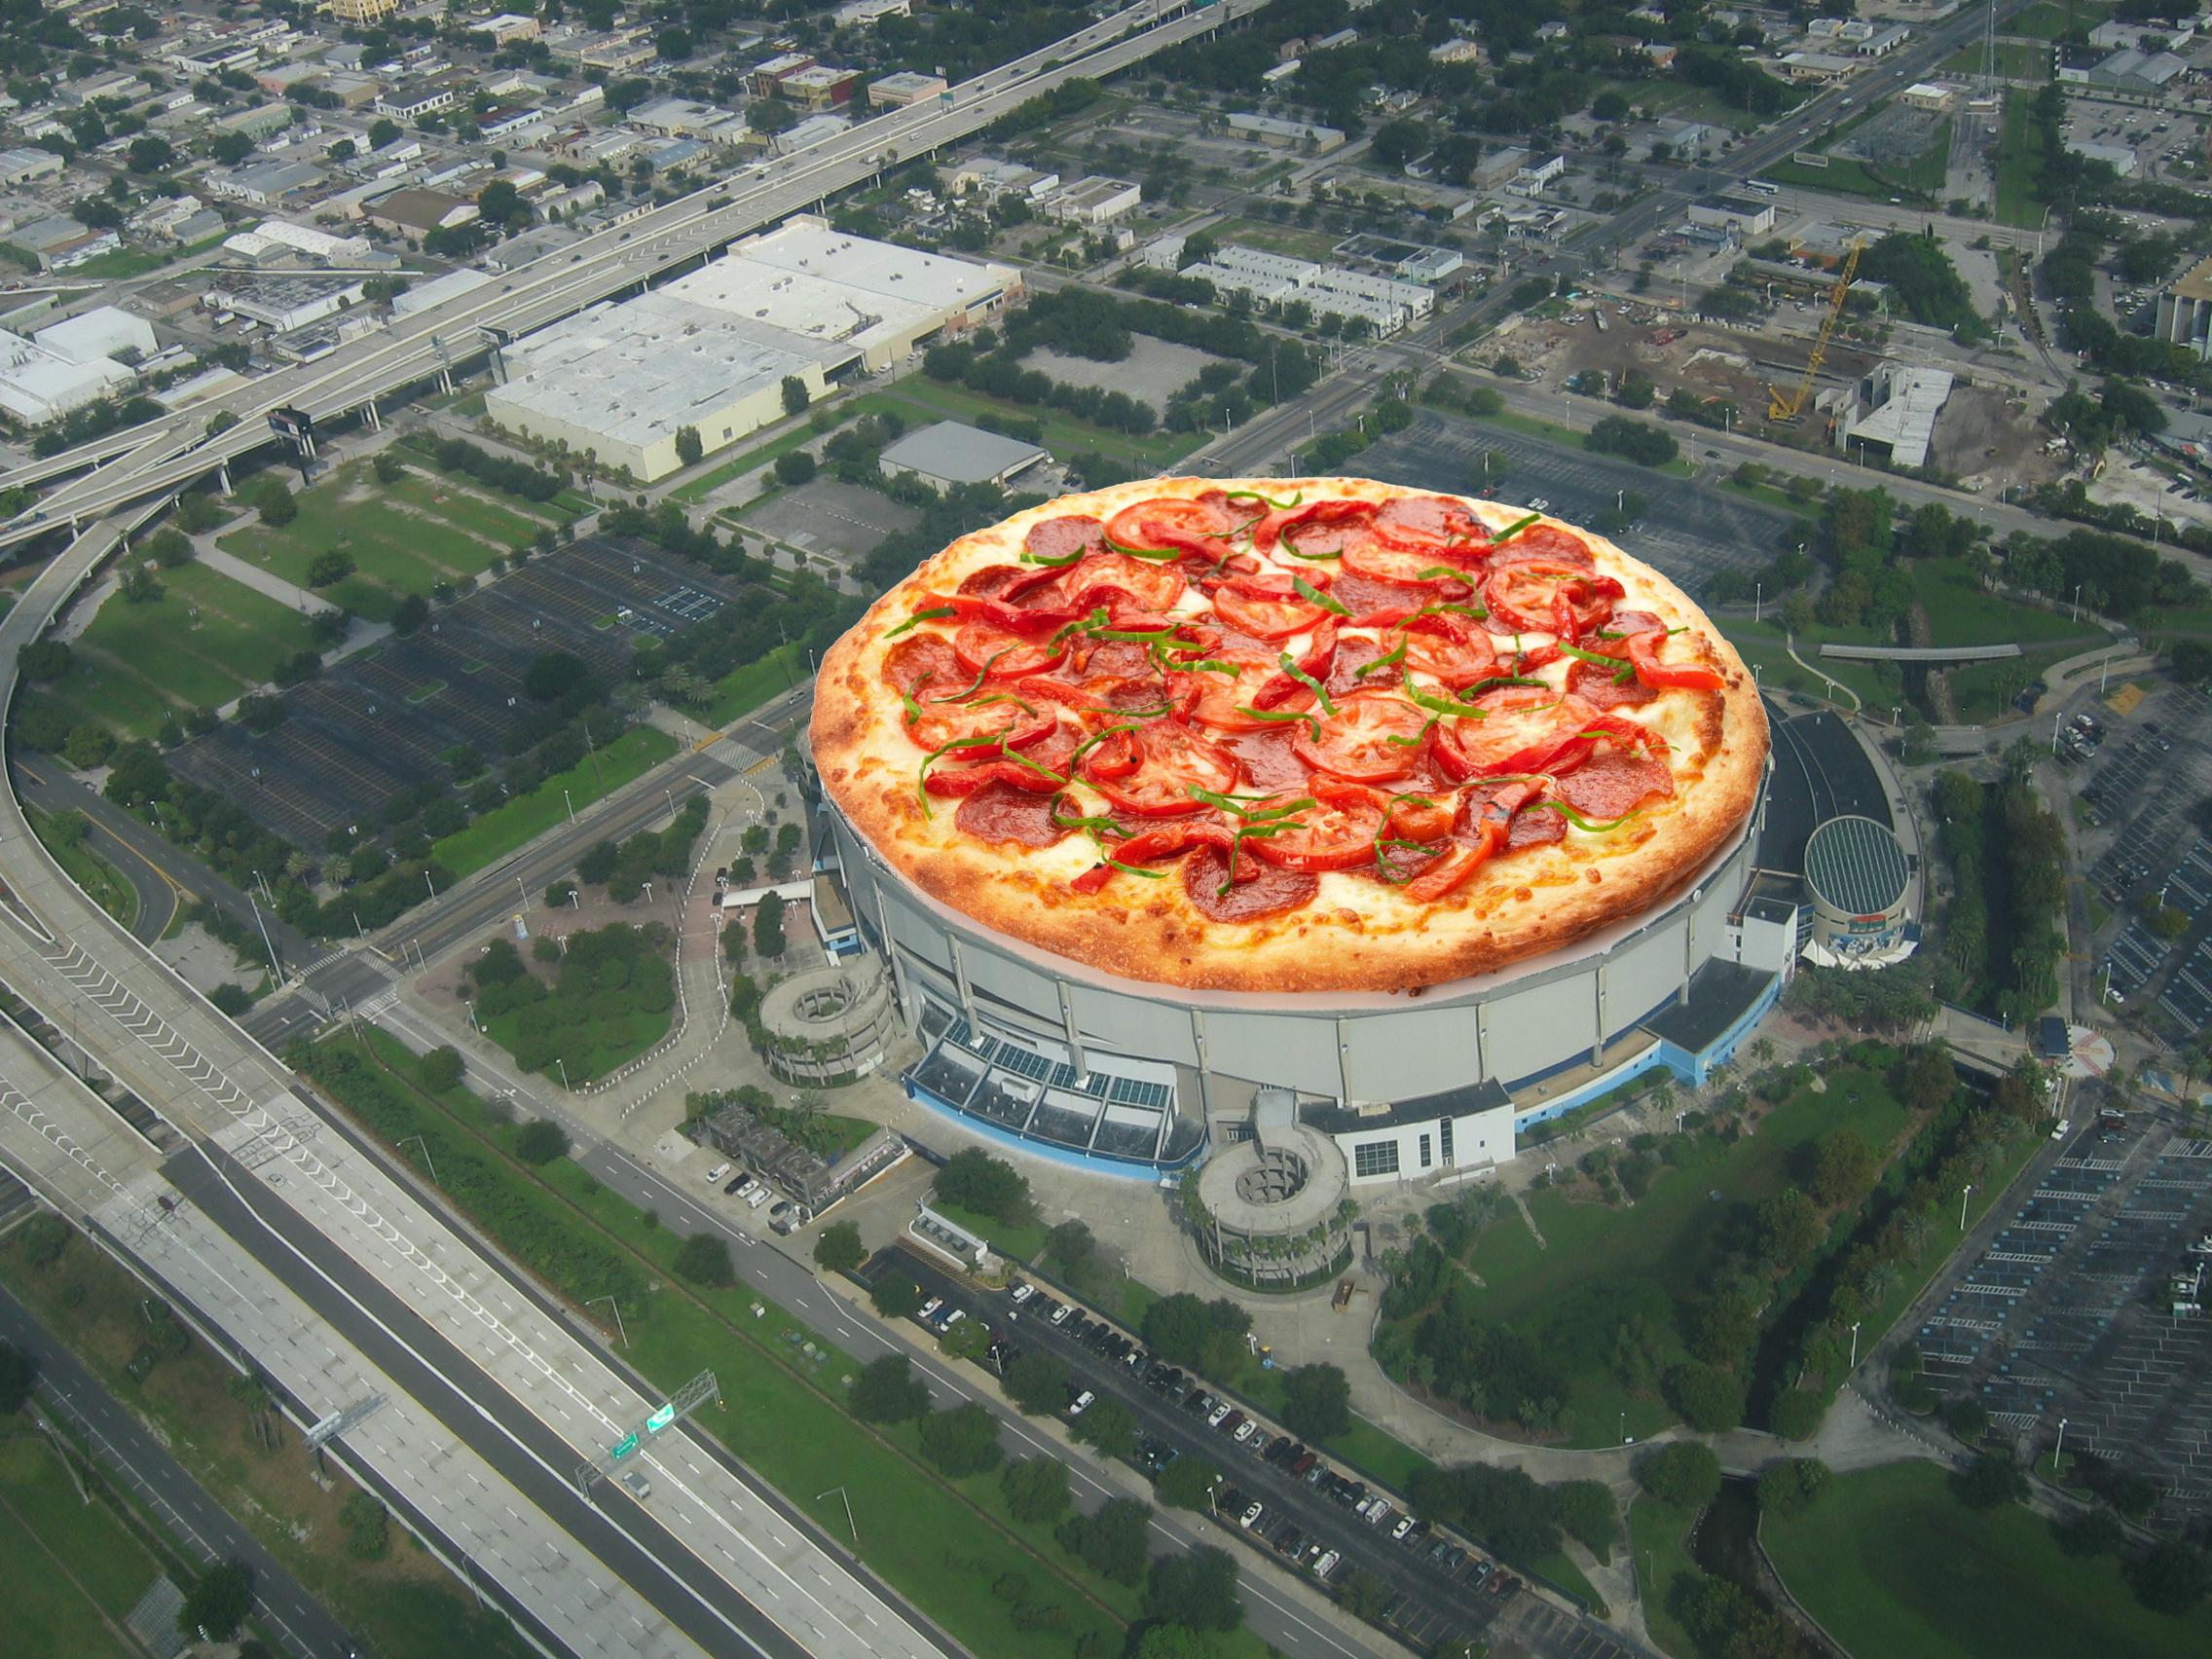 pizzacanafield